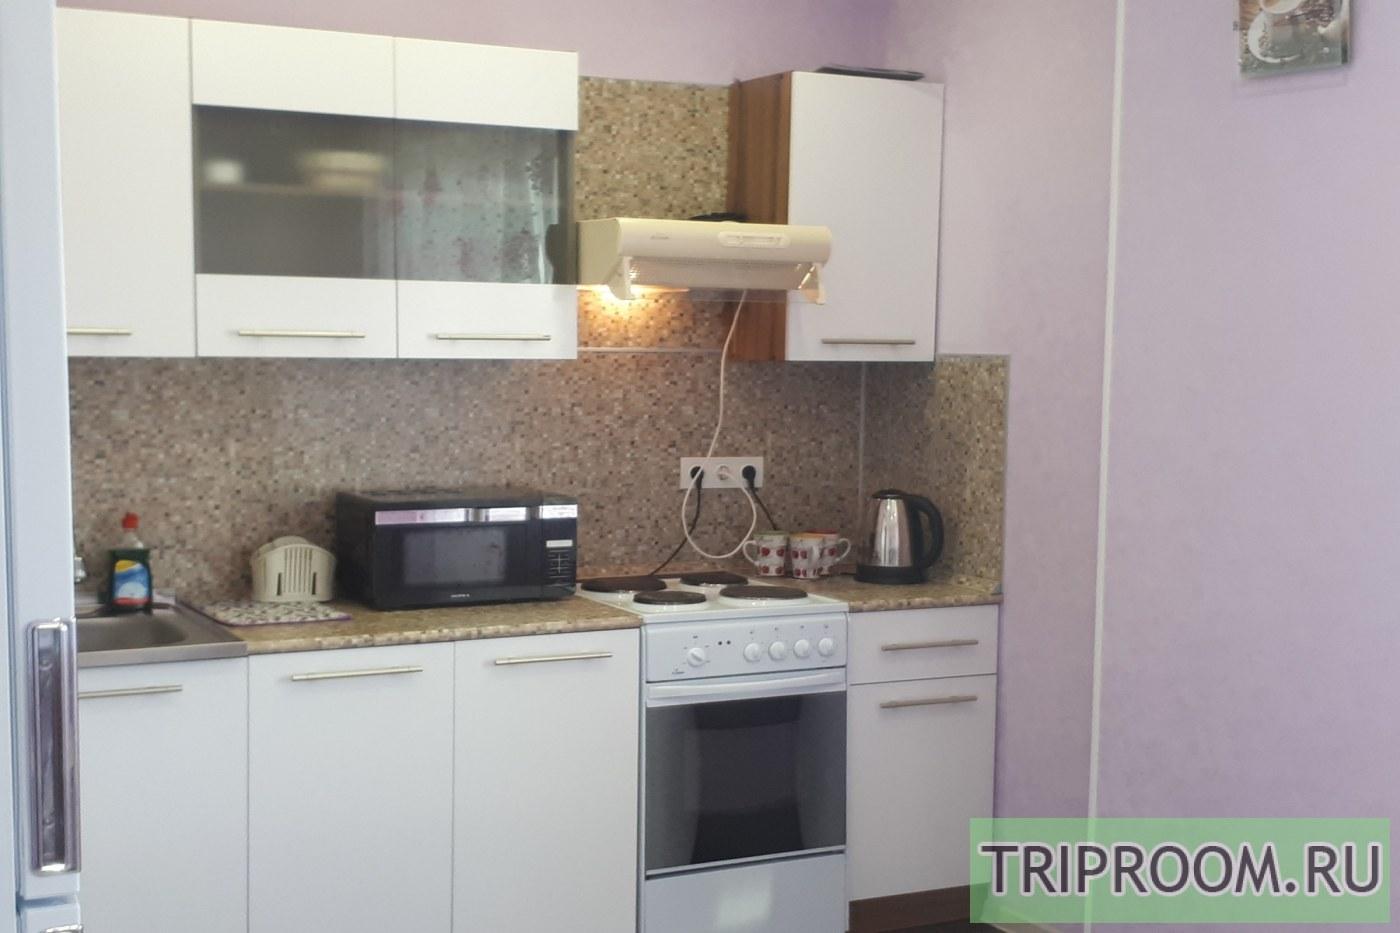 2-комнатная квартира посуточно (вариант № 39032), ул. Симиренко улица, фото № 7